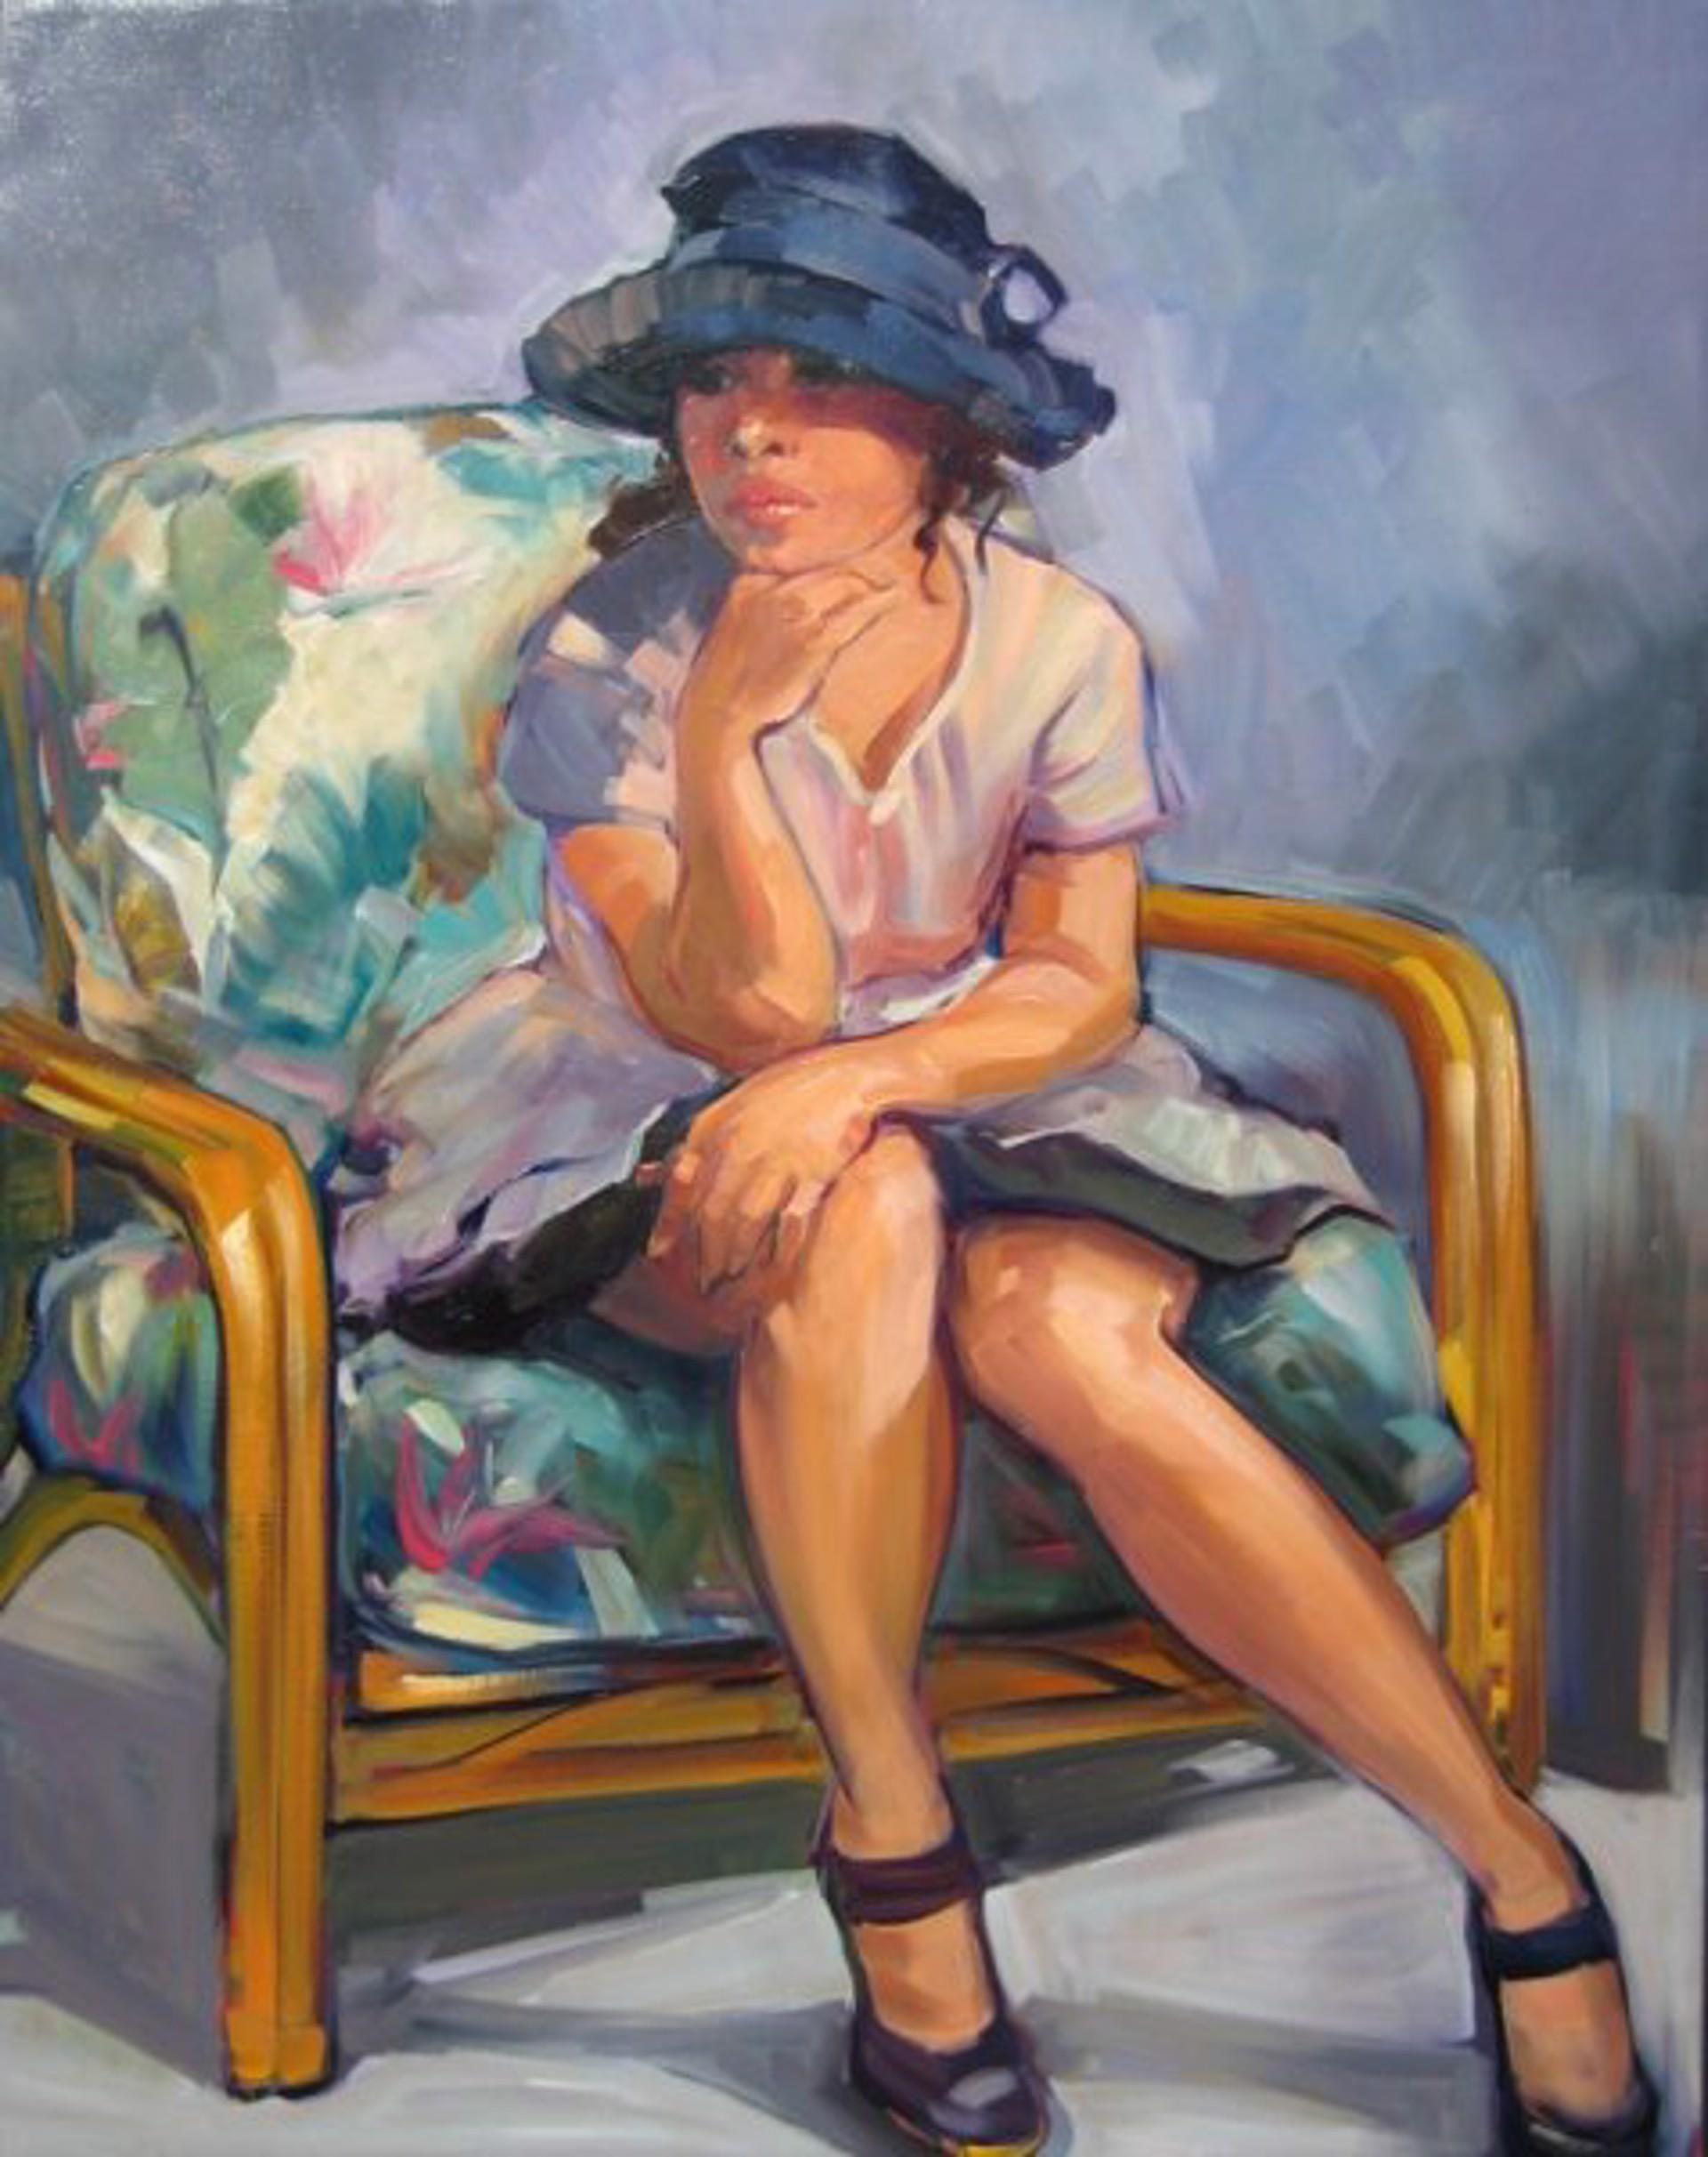 Vintage Hat (Maria Bertran) by Maria Bertrán